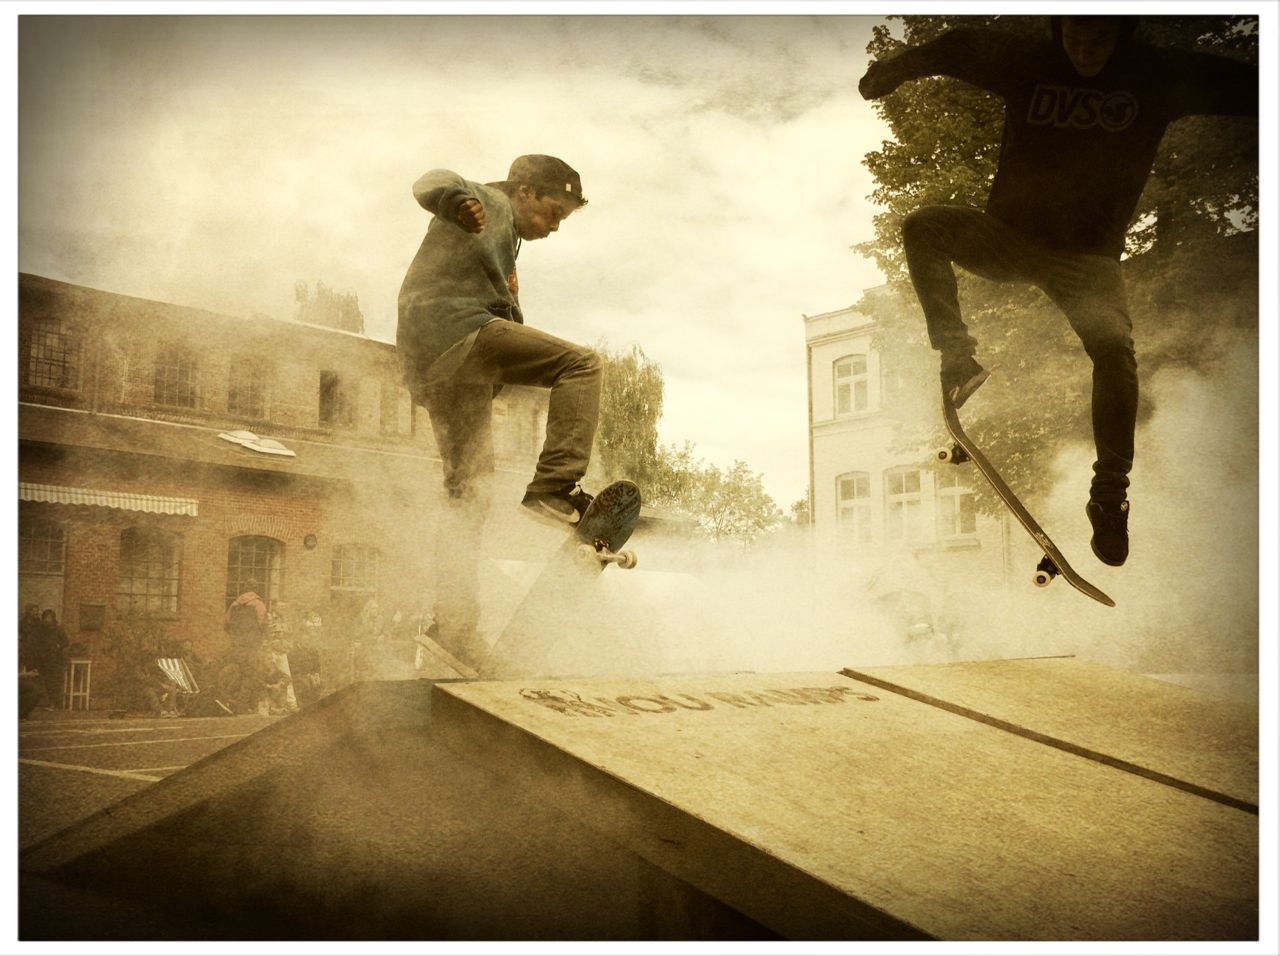 SSFHH12_Skateshow©Harkort:Fuchs.jpg